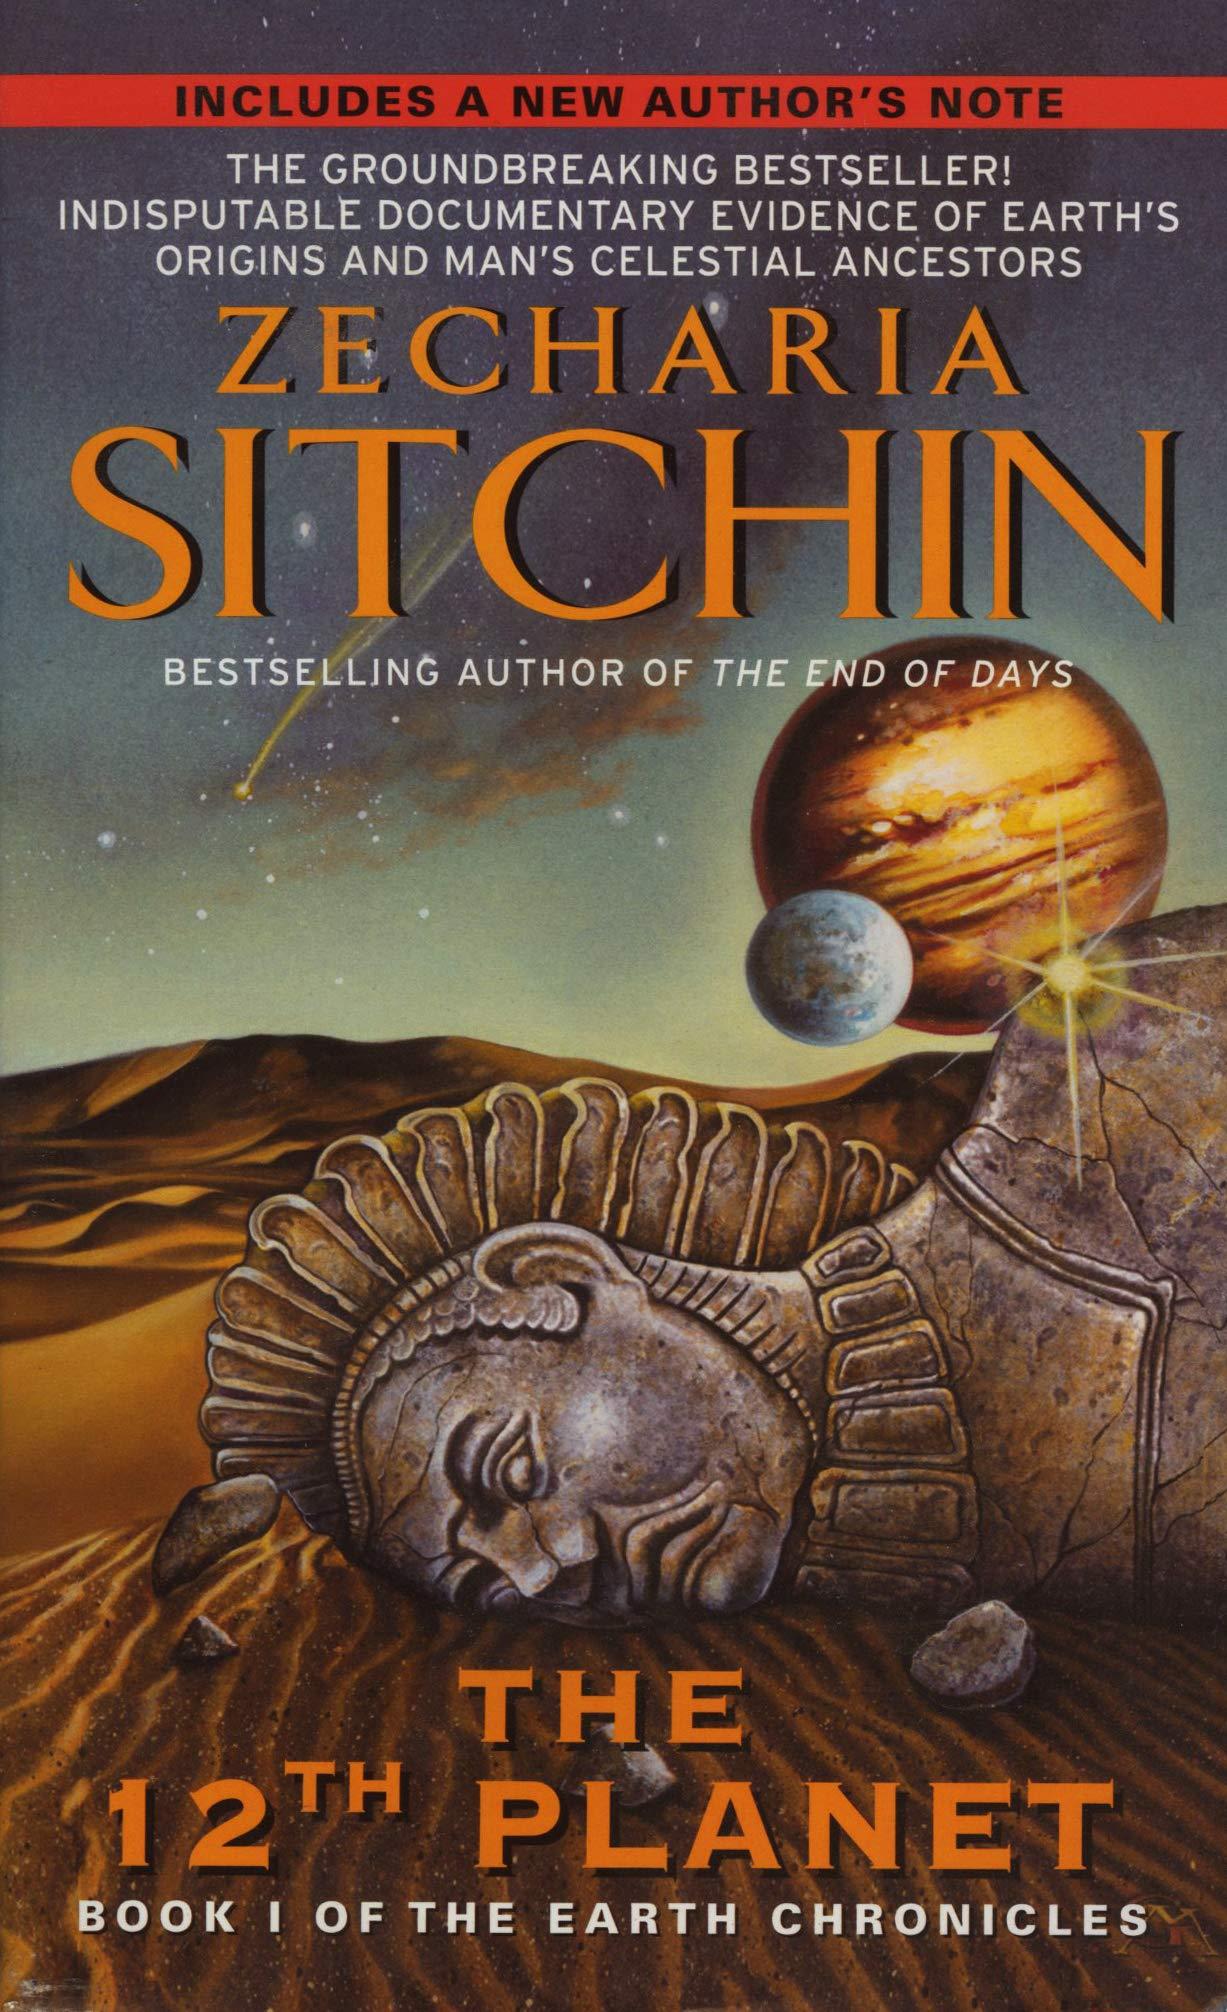 Twelfth Plan: Book I of the Earth Chronicles (Earth Chronicles, 1, Band 1)  : Sitchin, Zecharia: Amazon.de: Bücher